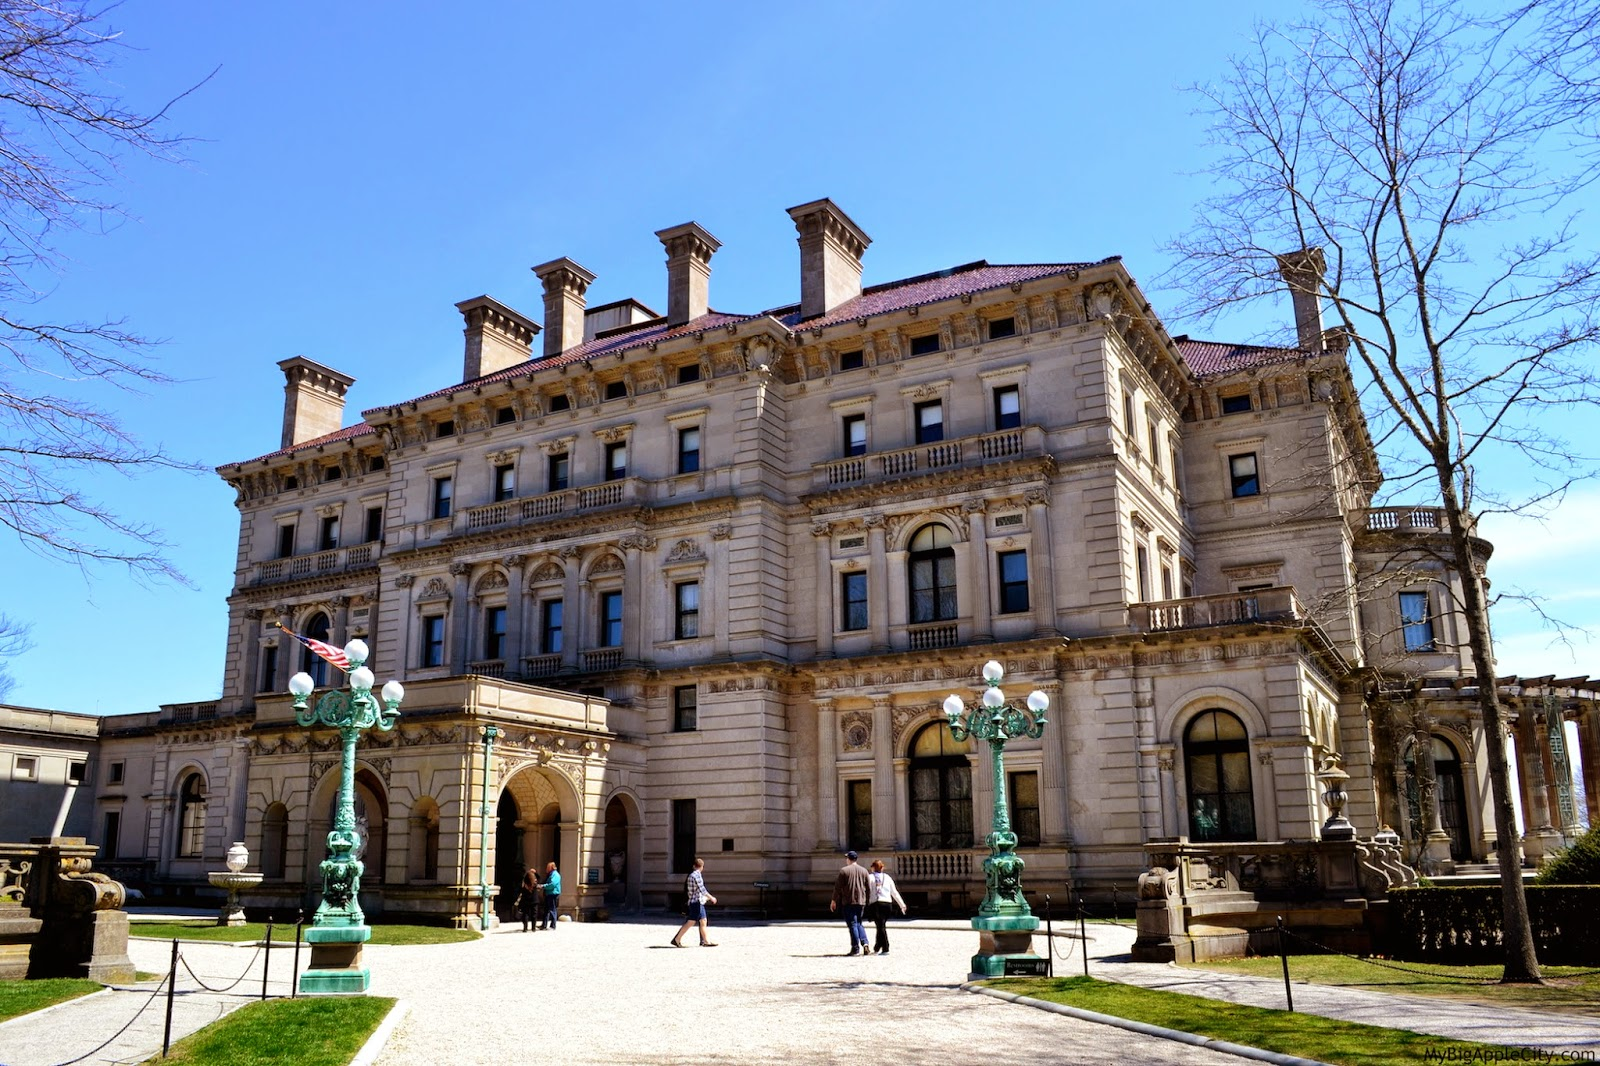 visit-newport-mansions-breakers-mybigapplecity